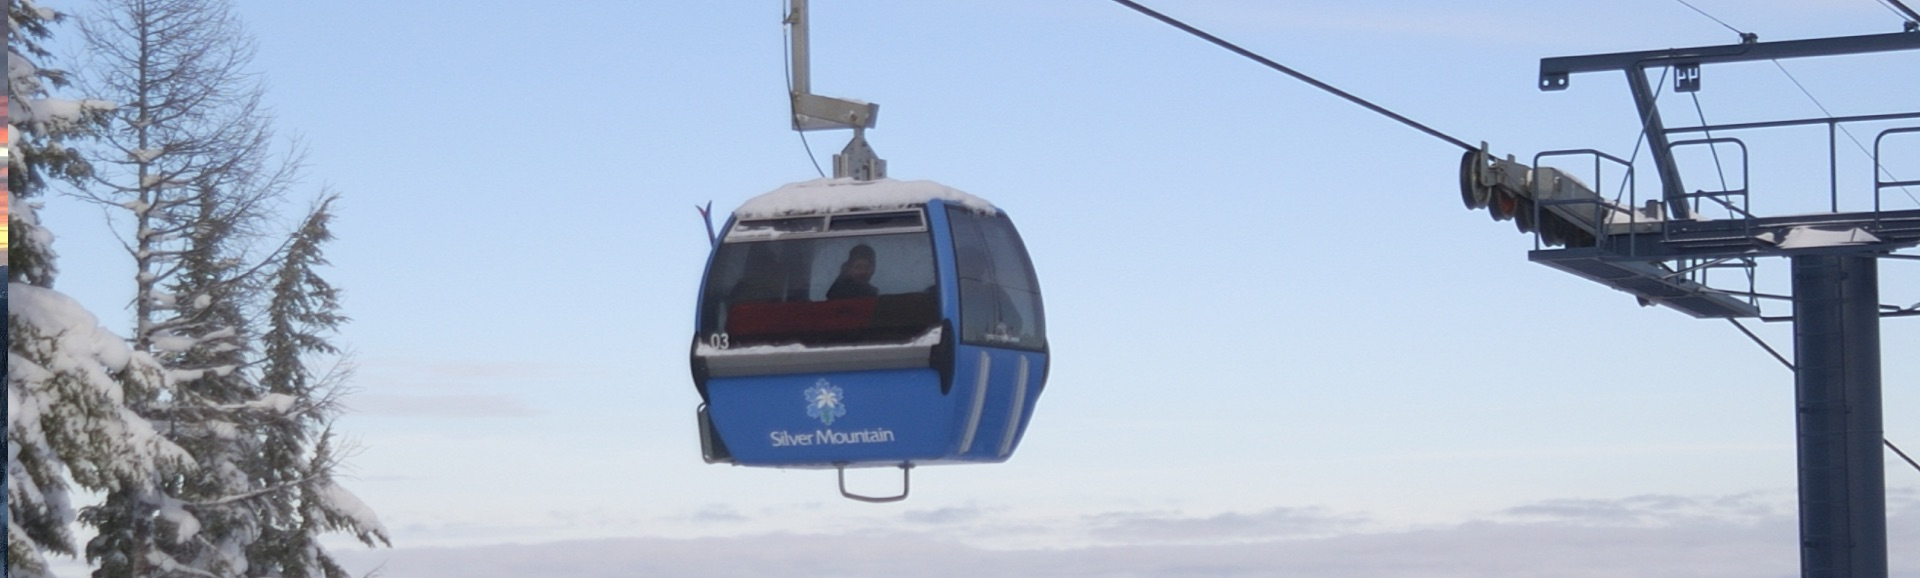 Ski/Ride Rentals desktop image